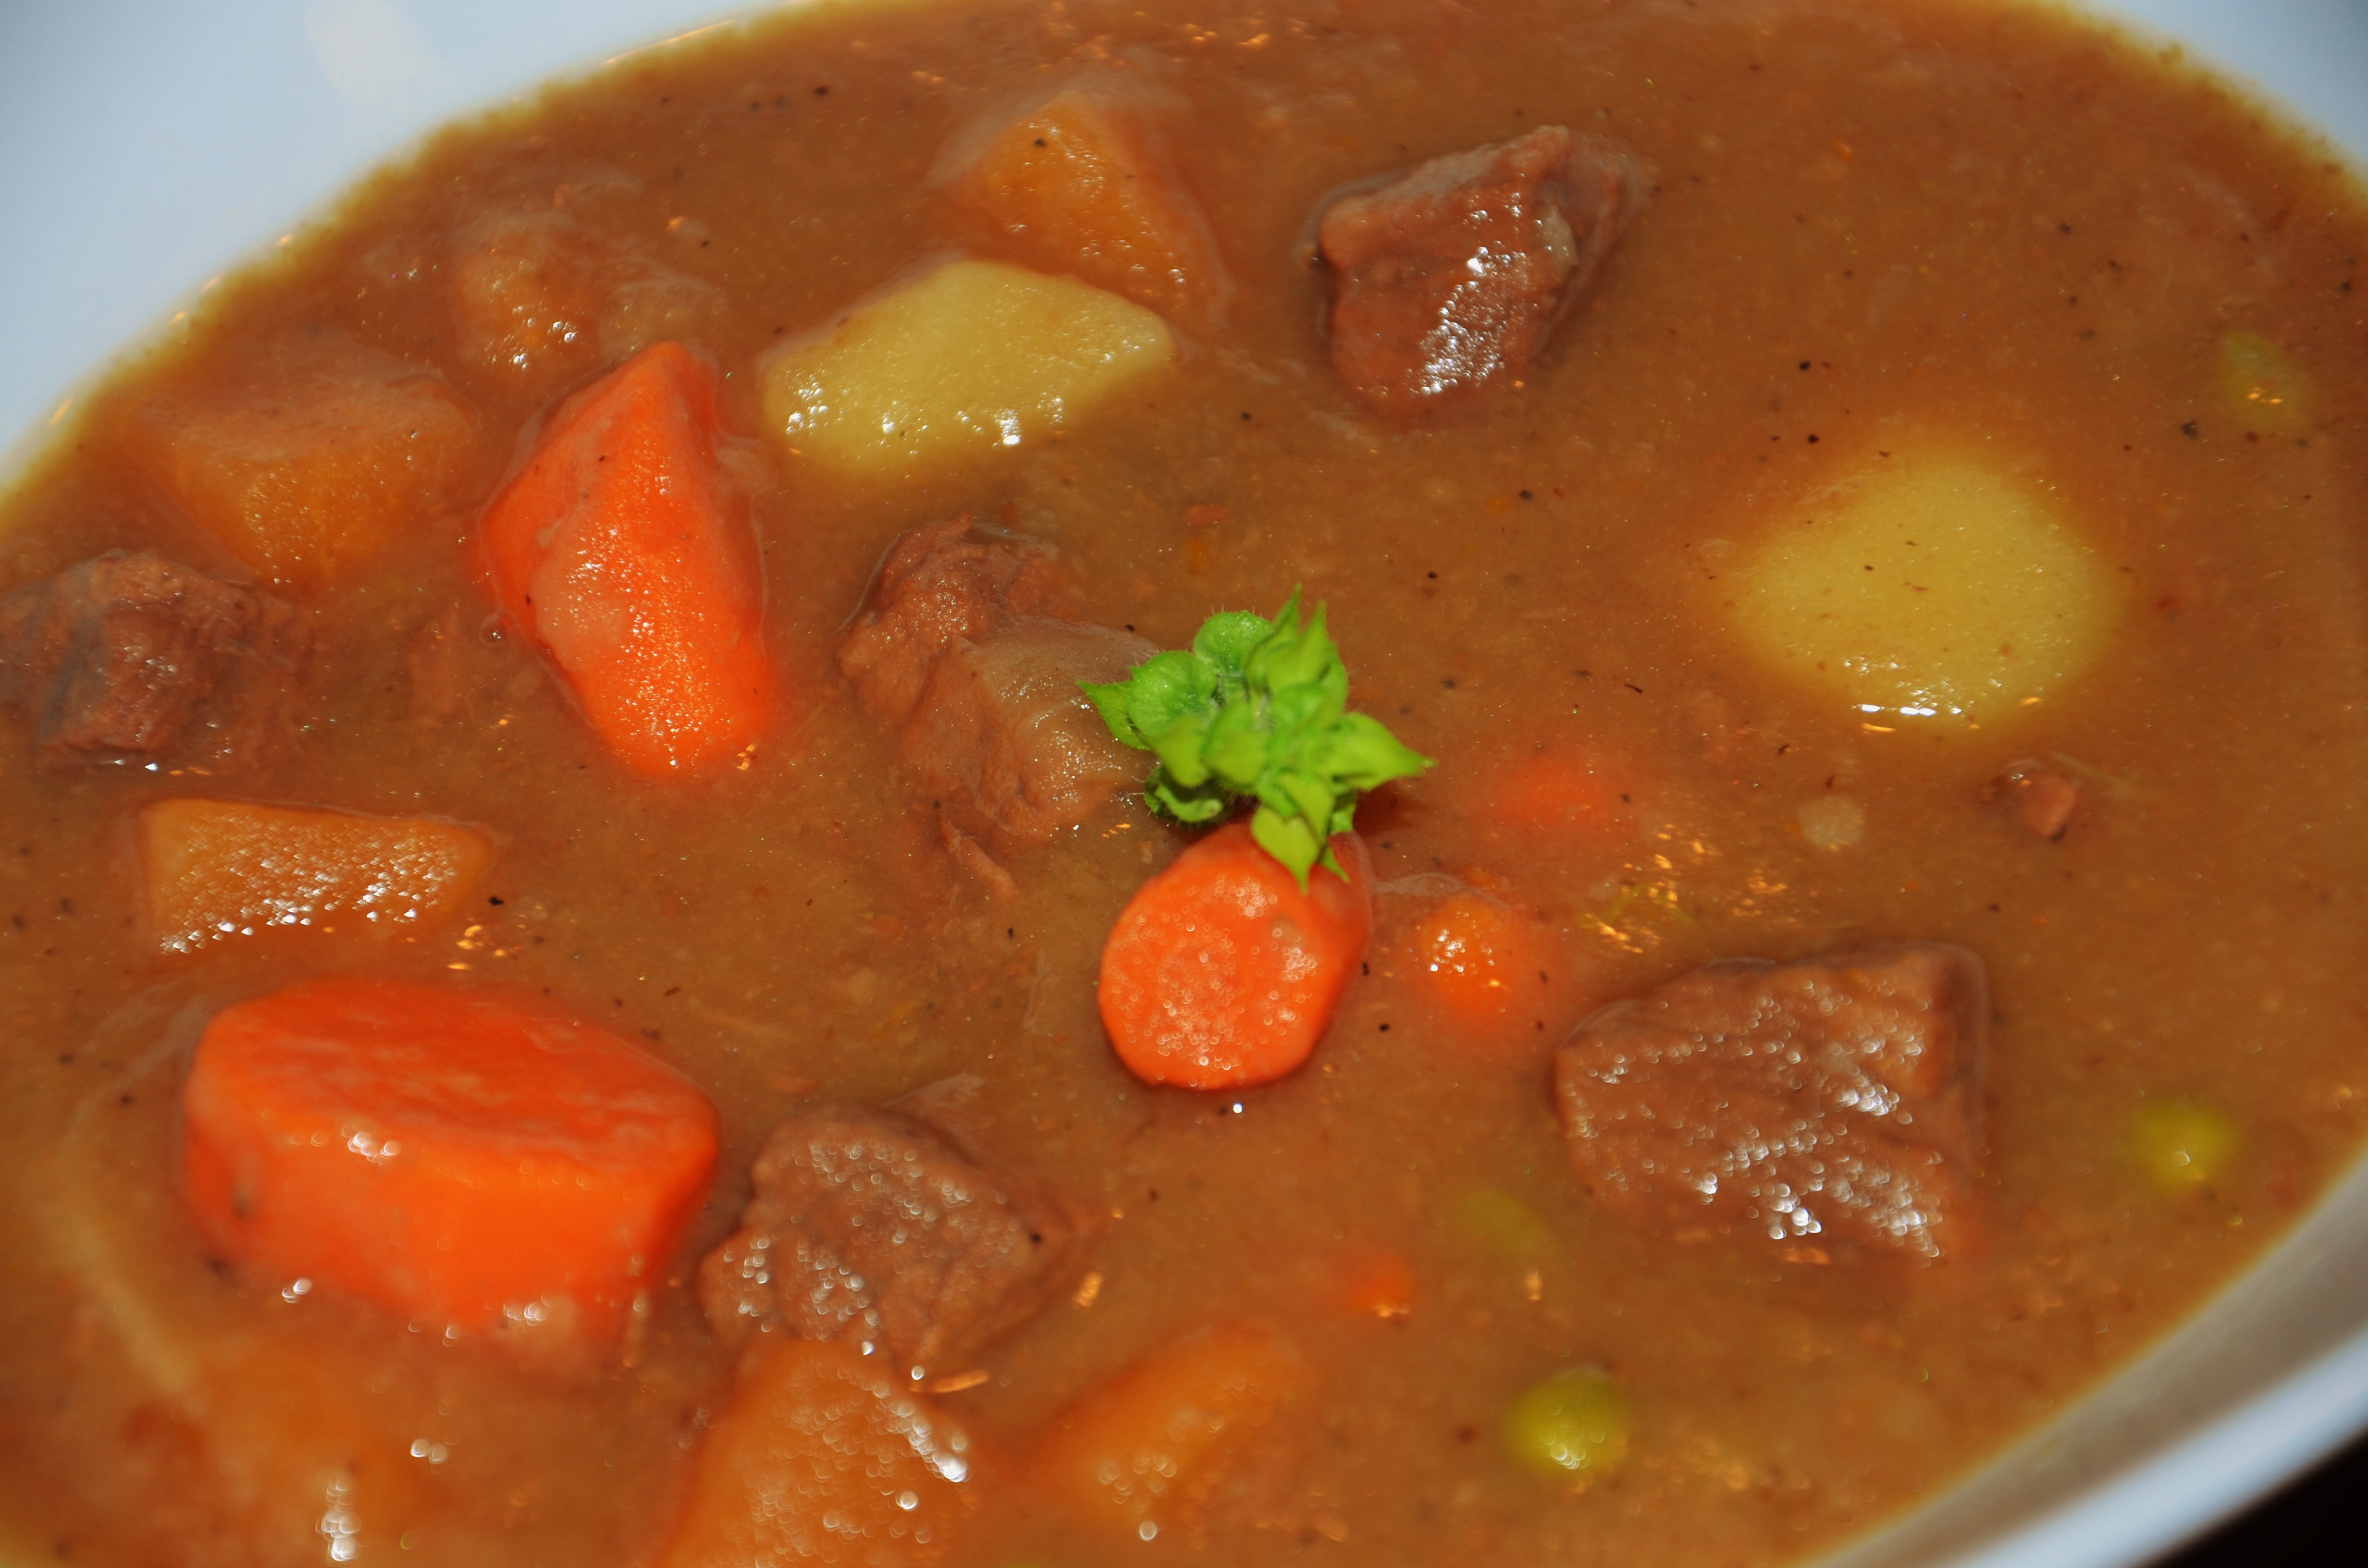 Gram's Irish Stew baldred14